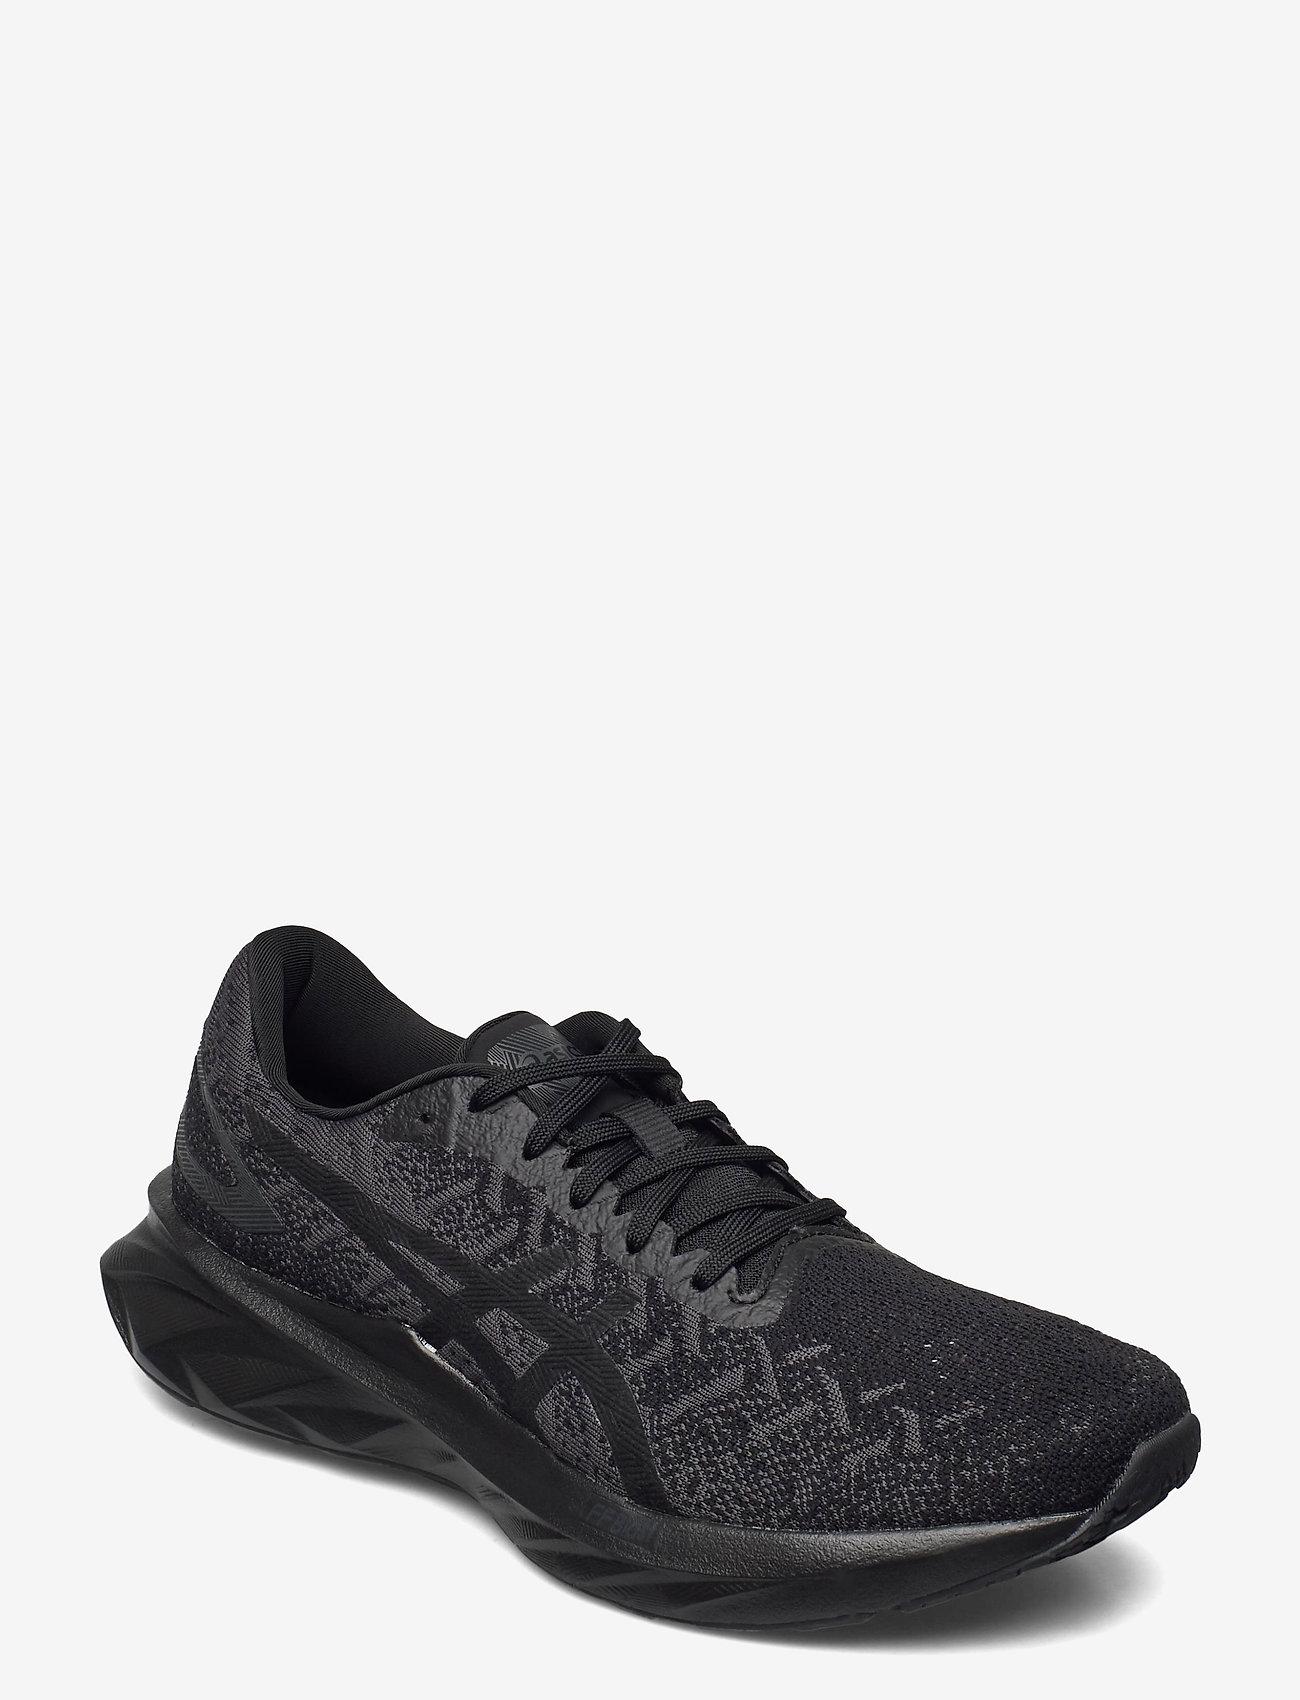 Asics - DYNABLAST - löbesko - black/graphite grey - 0